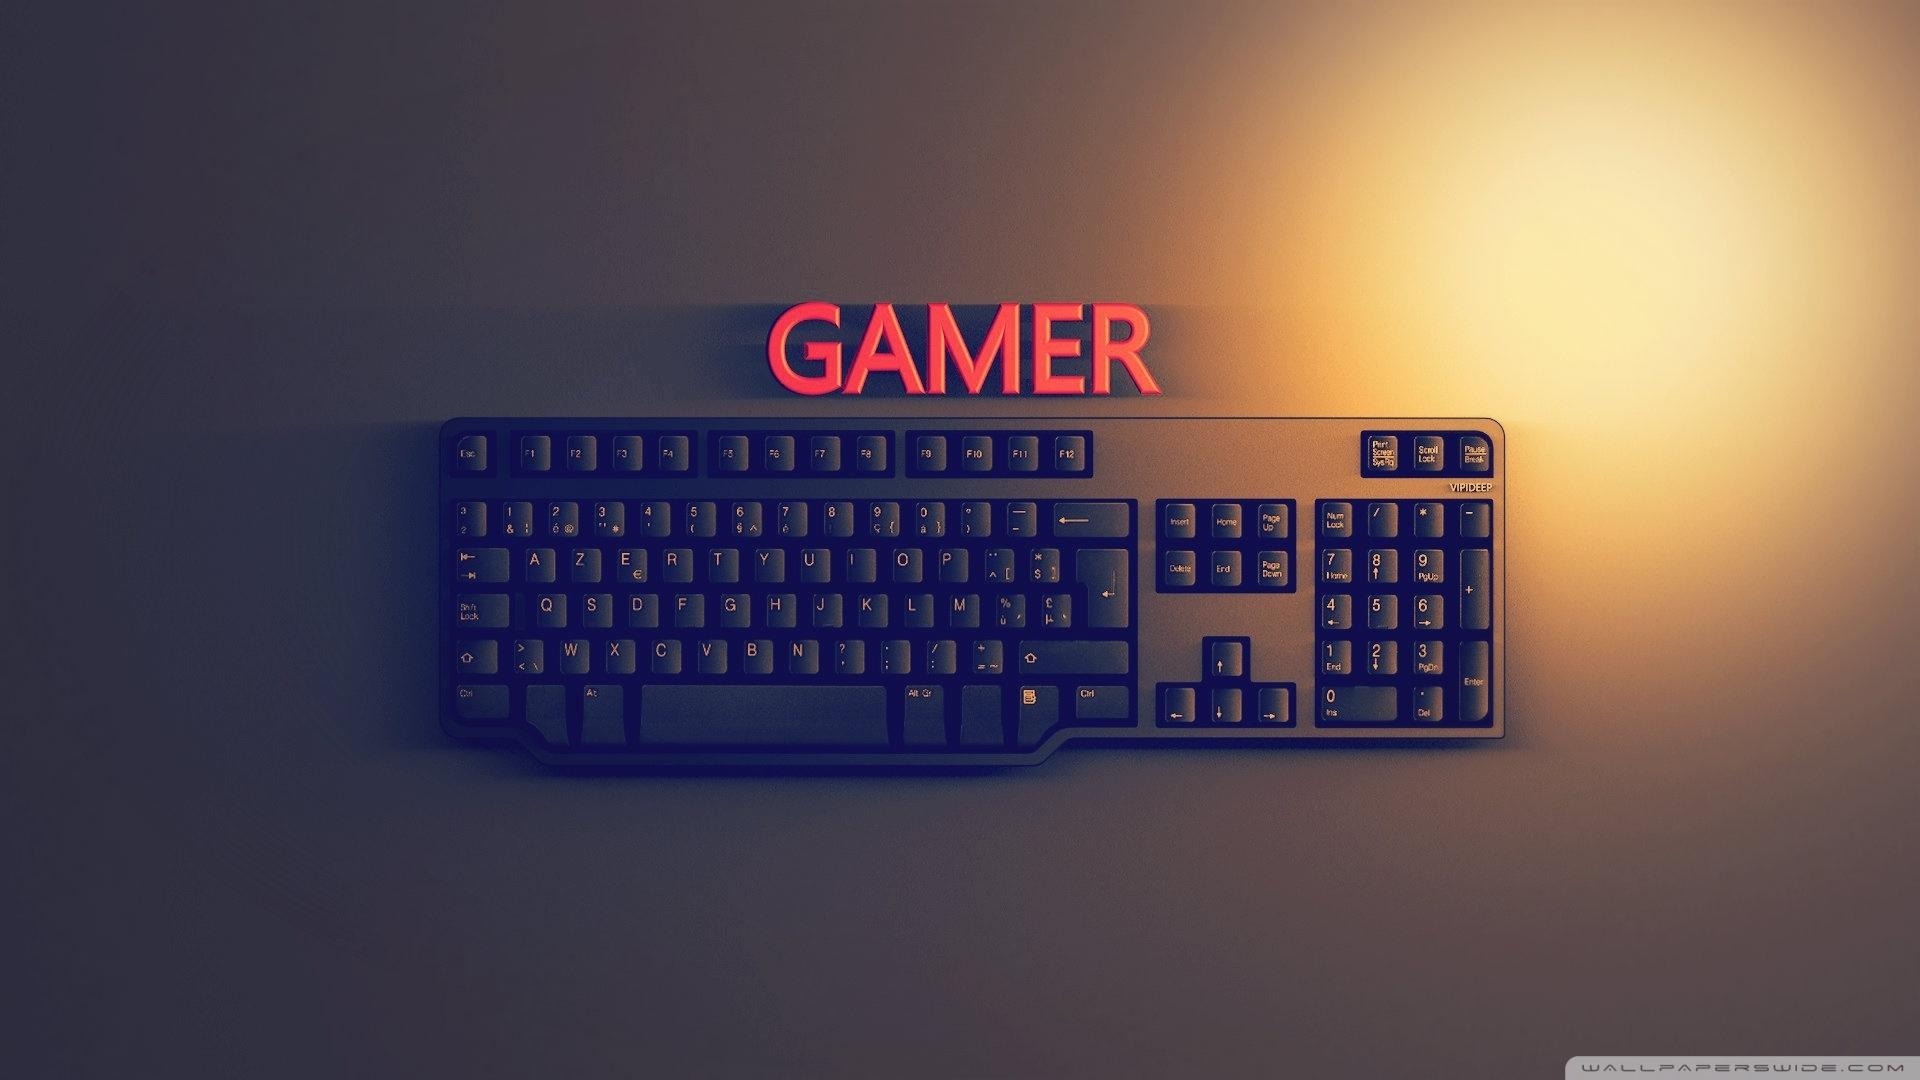 gamer ❤ 4k hd desktop wallpaper for 4k ultra hd tv • wide & ultra